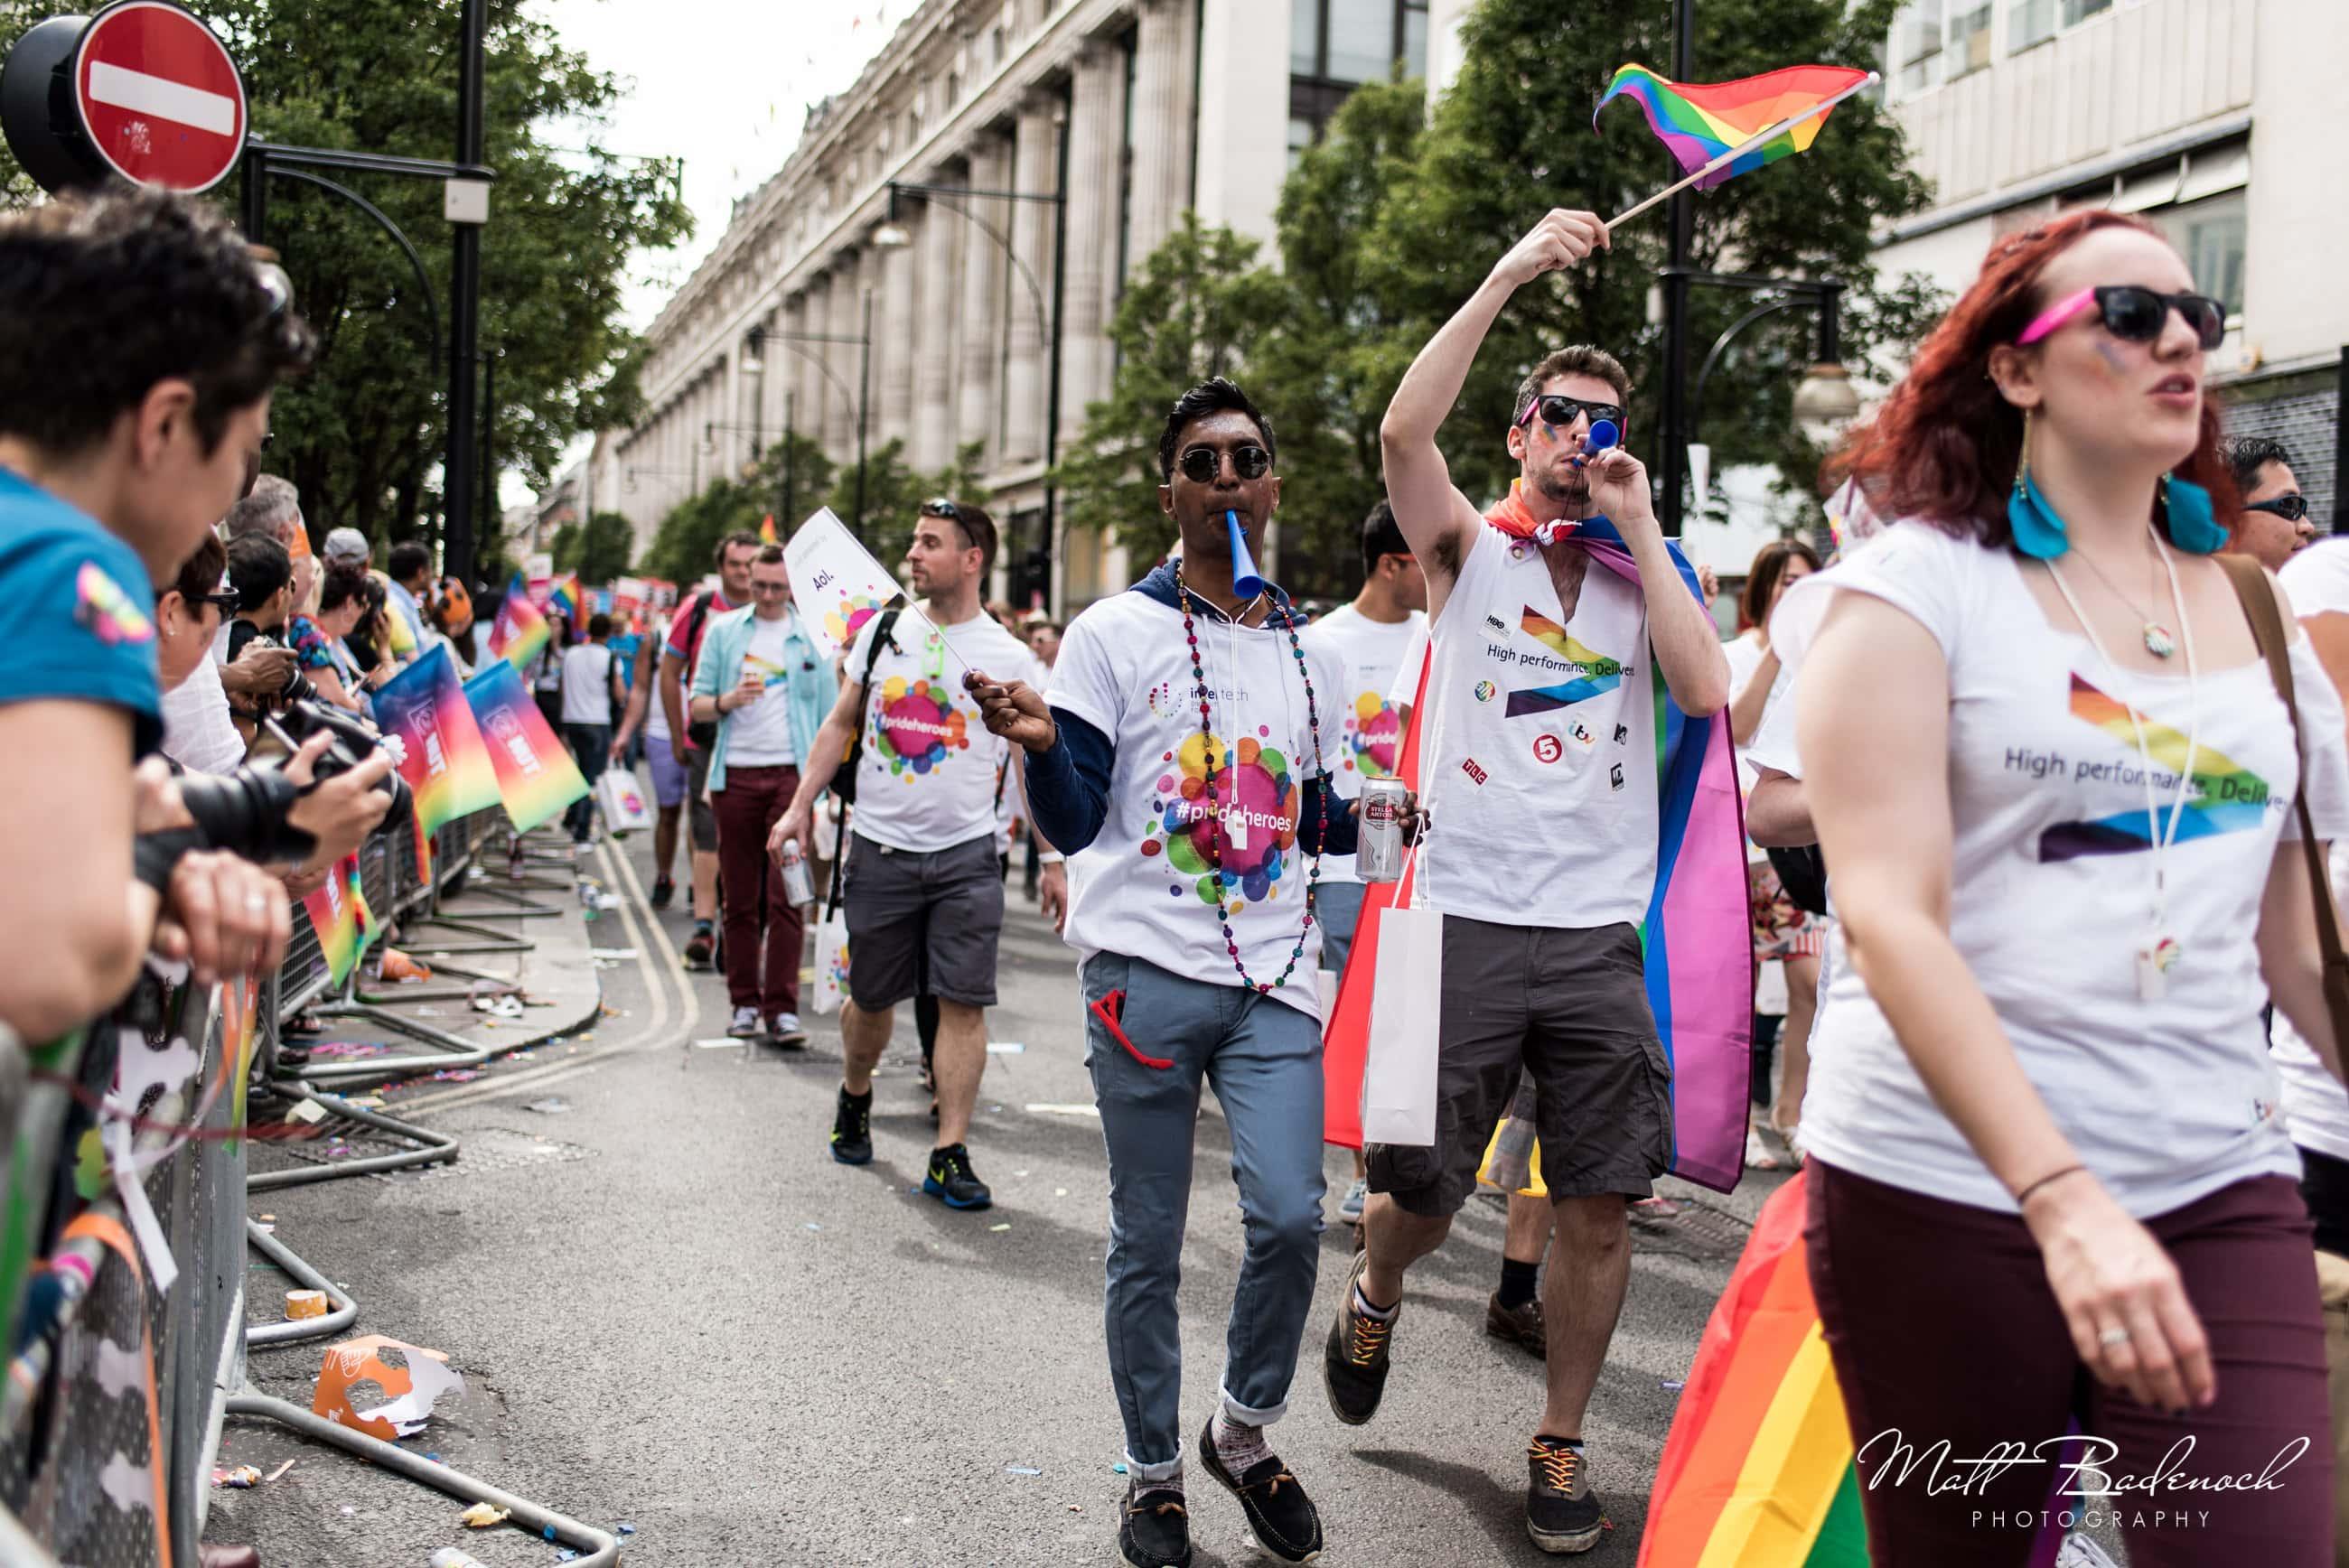 Accenture, London Pride Parade 2015 Photos